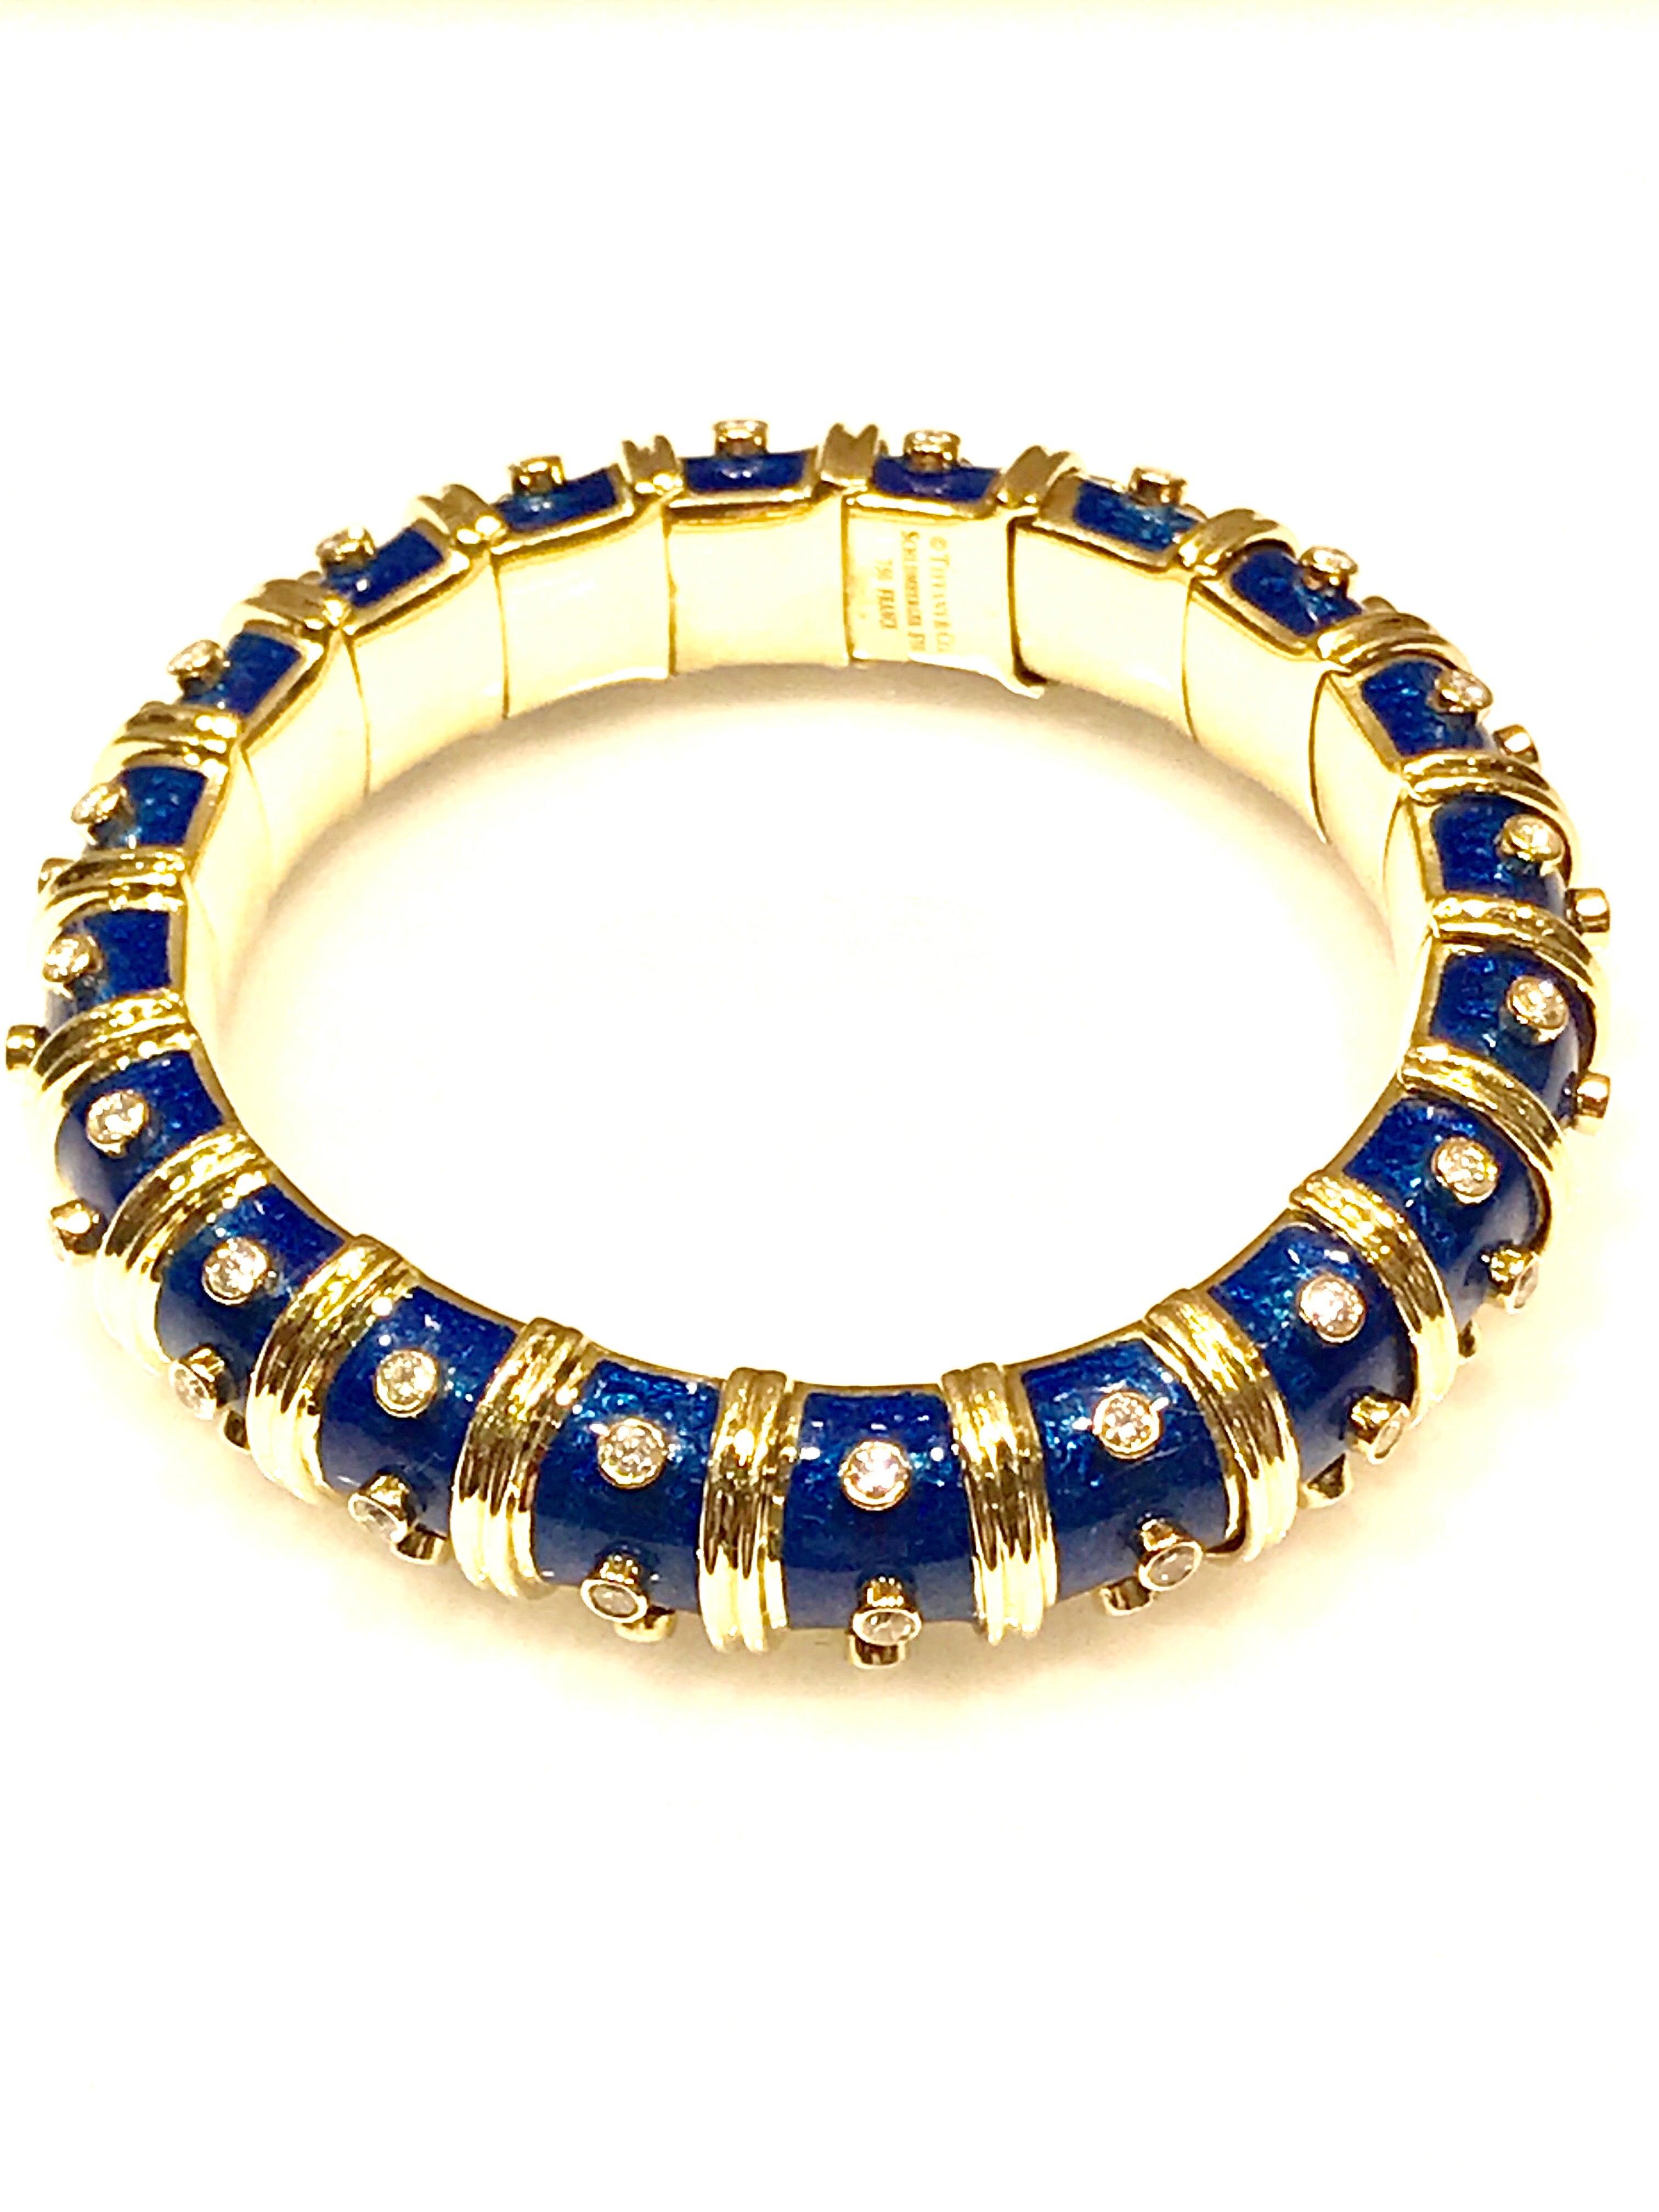 6f31055a4 Tiffany and Co. Schlumberger Blue Enamel and Bezel Set Diamond Bangle  Bracelet at 1stdibs